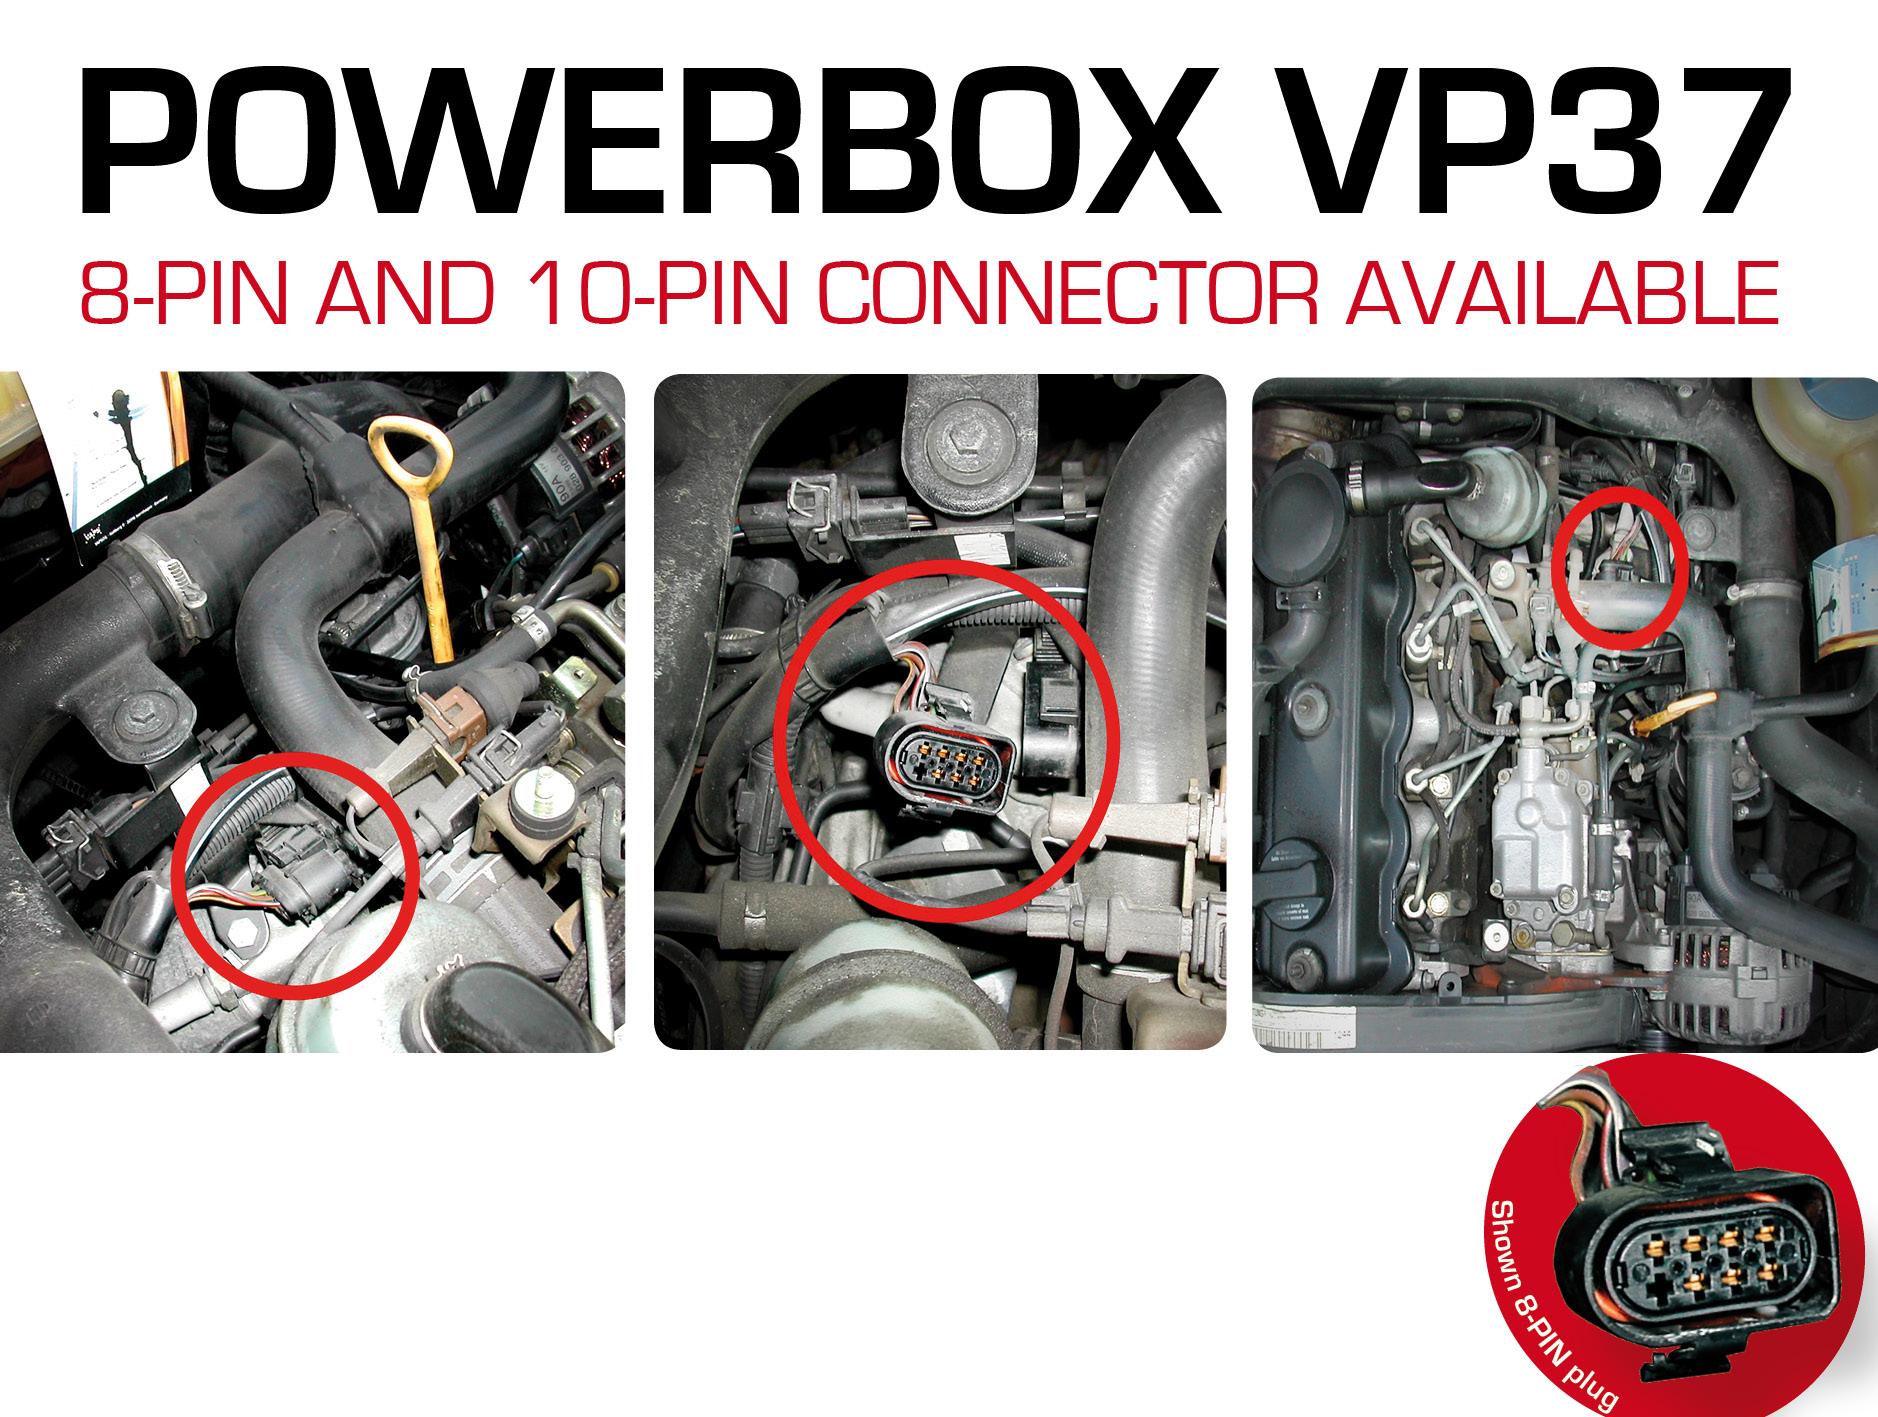 Power Box VP37 Diesel Performance Tuningchip for VW VOLKSWAGEN TDI